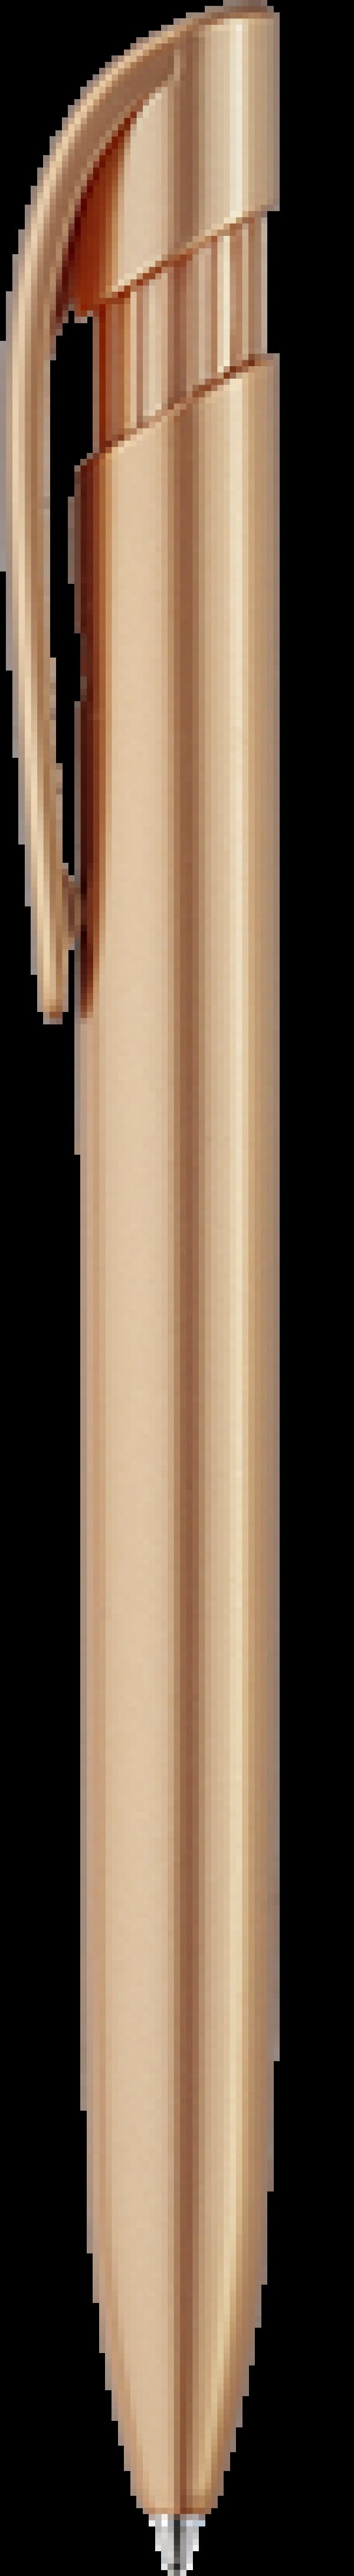 Шариковая ручка g 0-0093 LUX YES